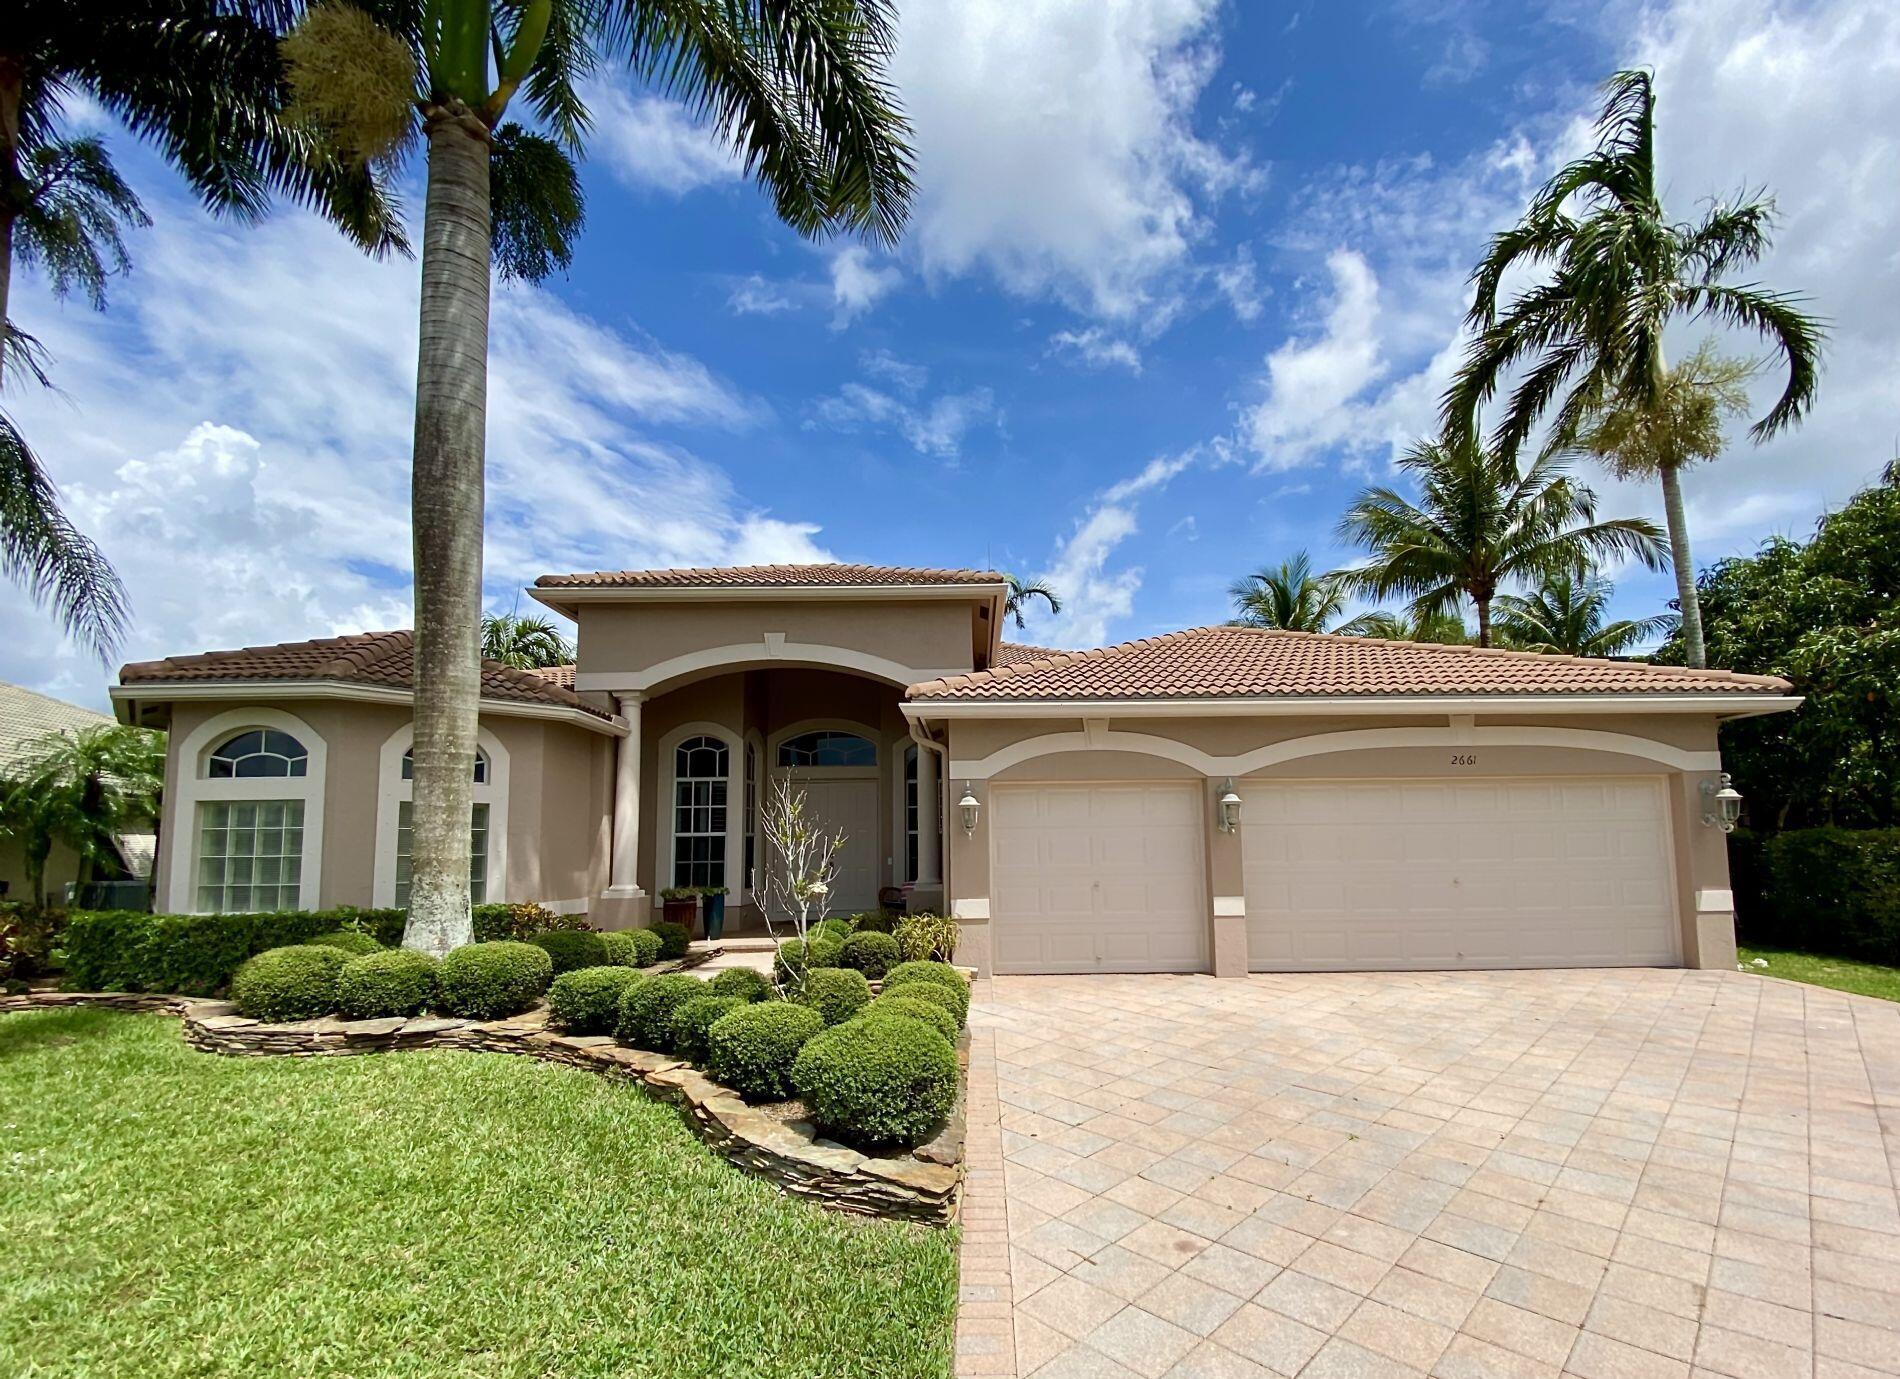 2661  Windwood Way  For Sale 10726764, FL